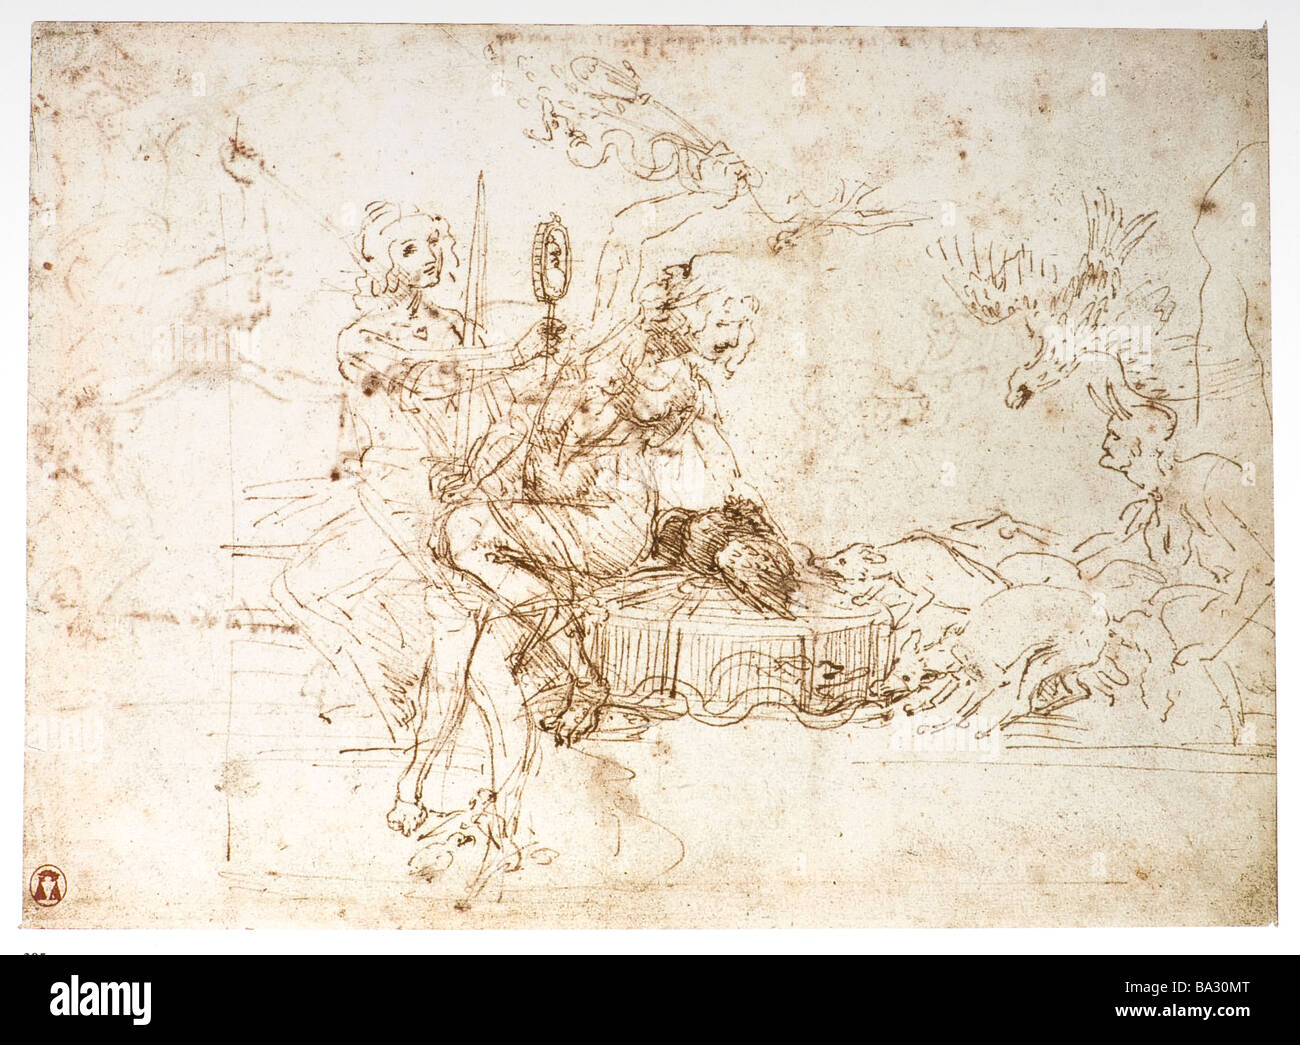 Allegory of statecraft justice and prudence by leonardo da vinci